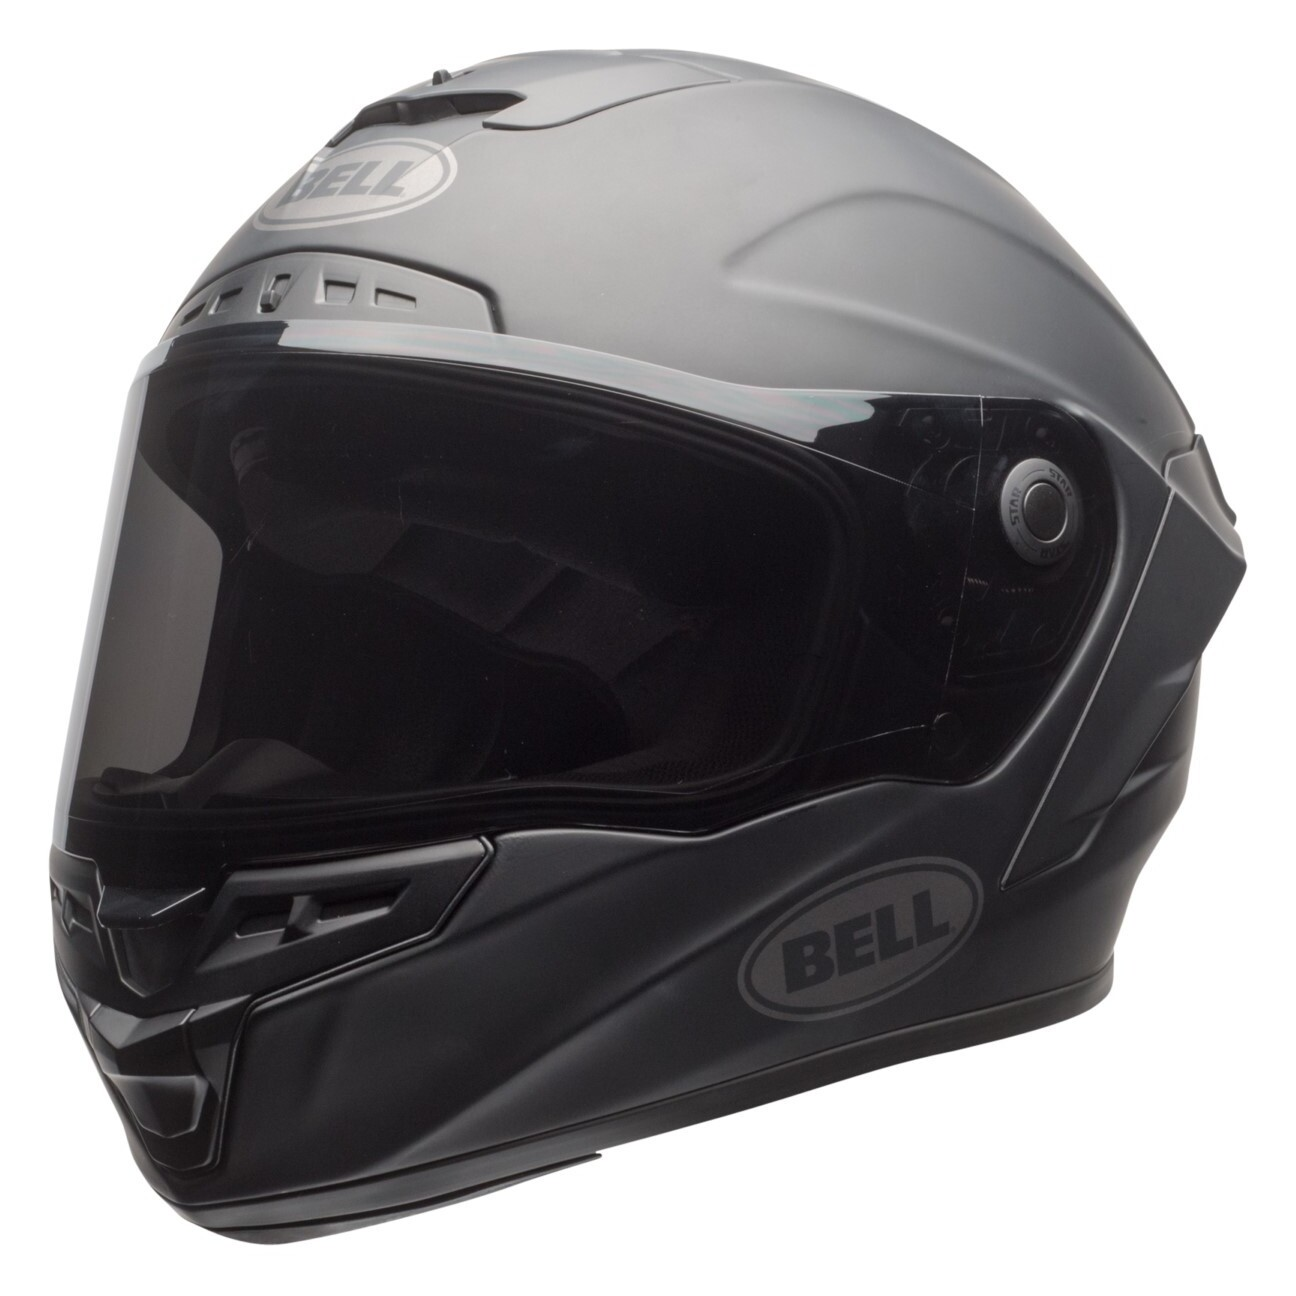 Bell Star Mips Dlx Helmet Matte Black Xl Demo Good